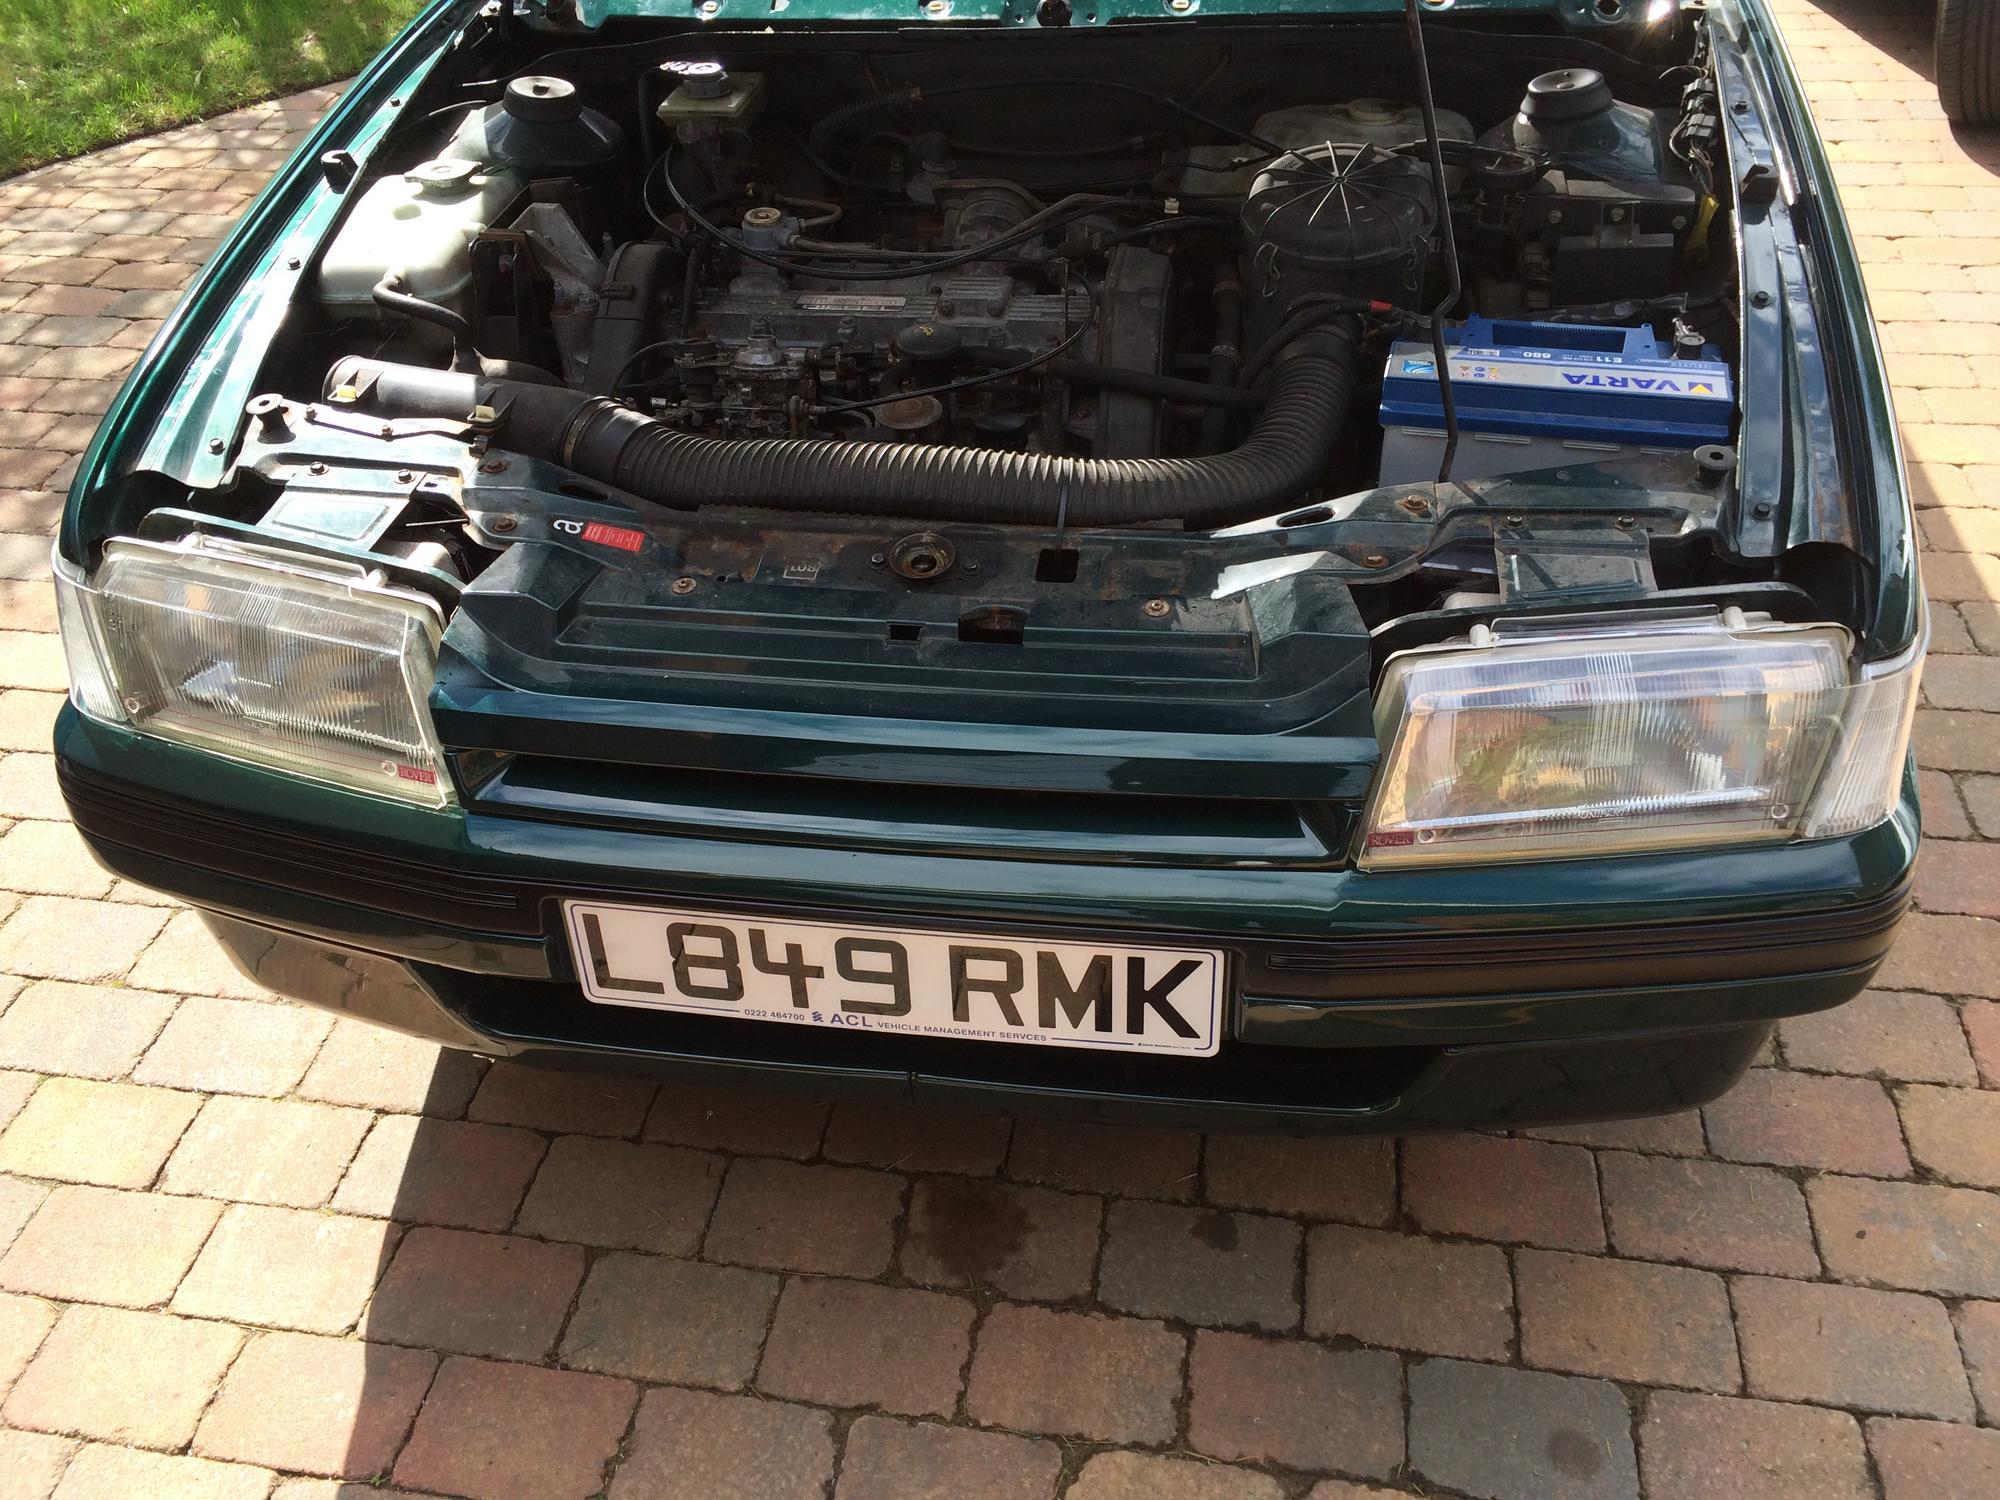 1994 Rover Montego Countryman 2.0D - L849 RMK - Maestro ...